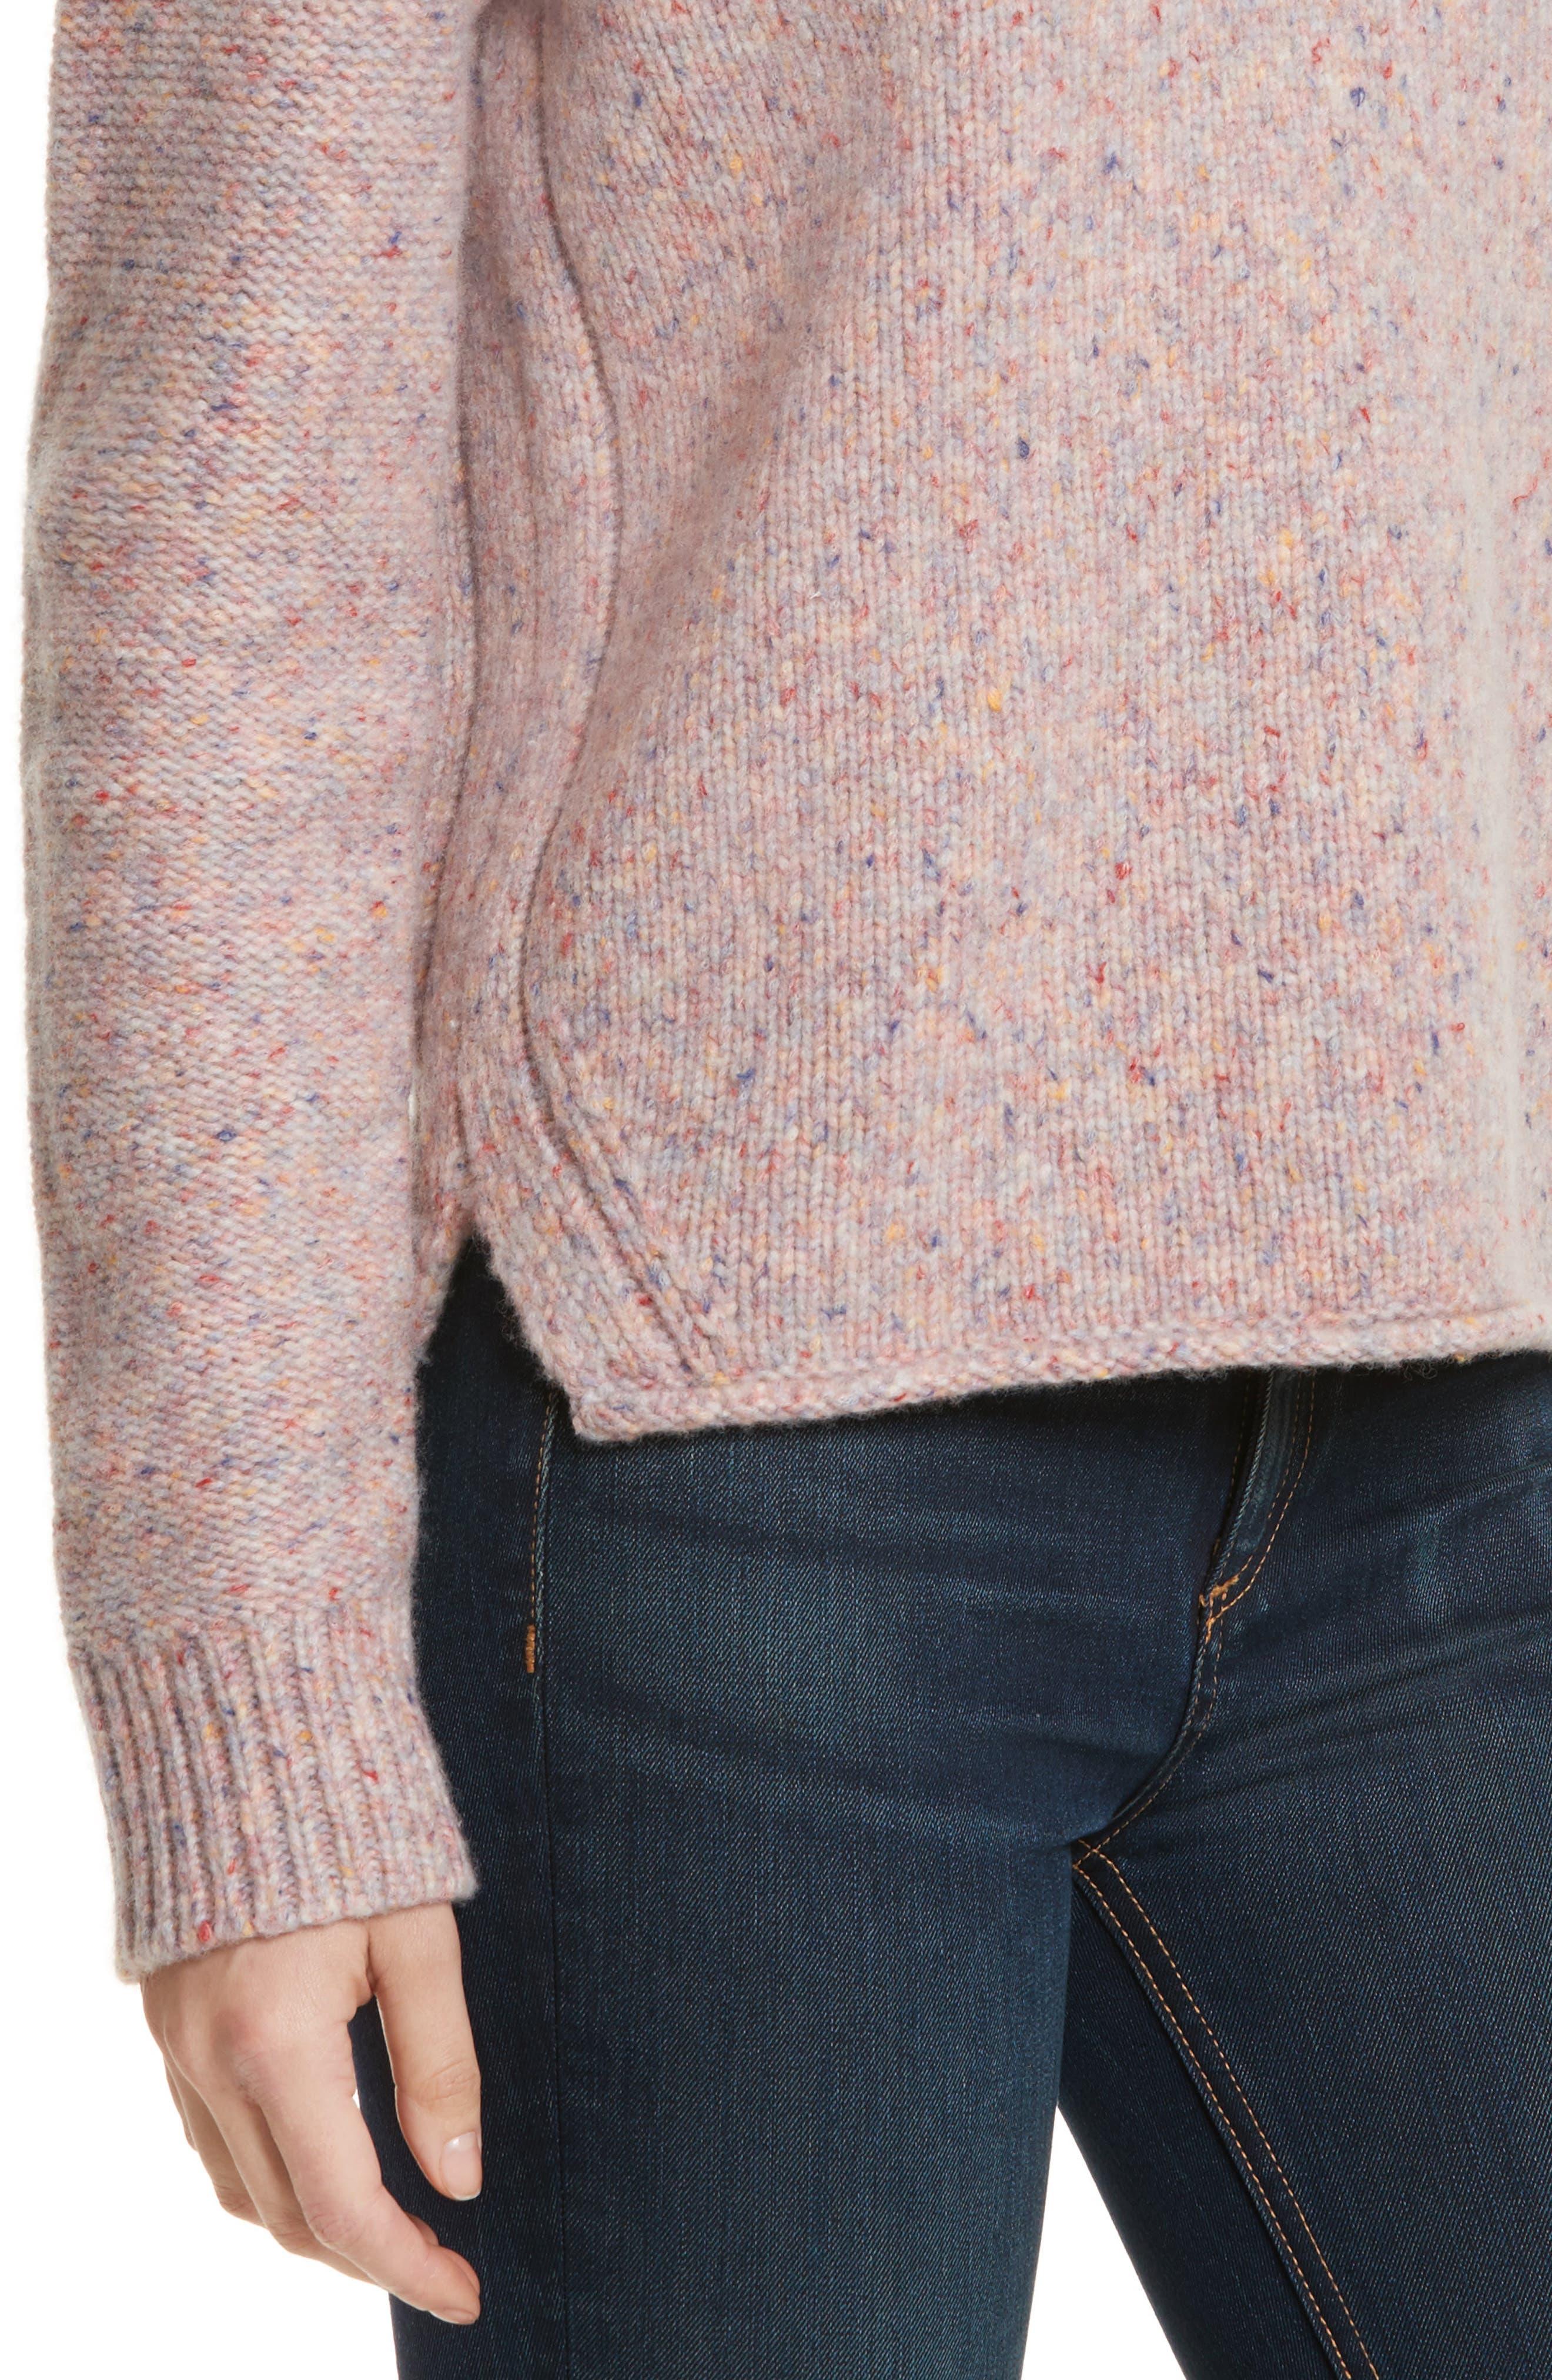 Francie Suede Trim Wool Blend Sweater,                             Alternate thumbnail 4, color,                             691